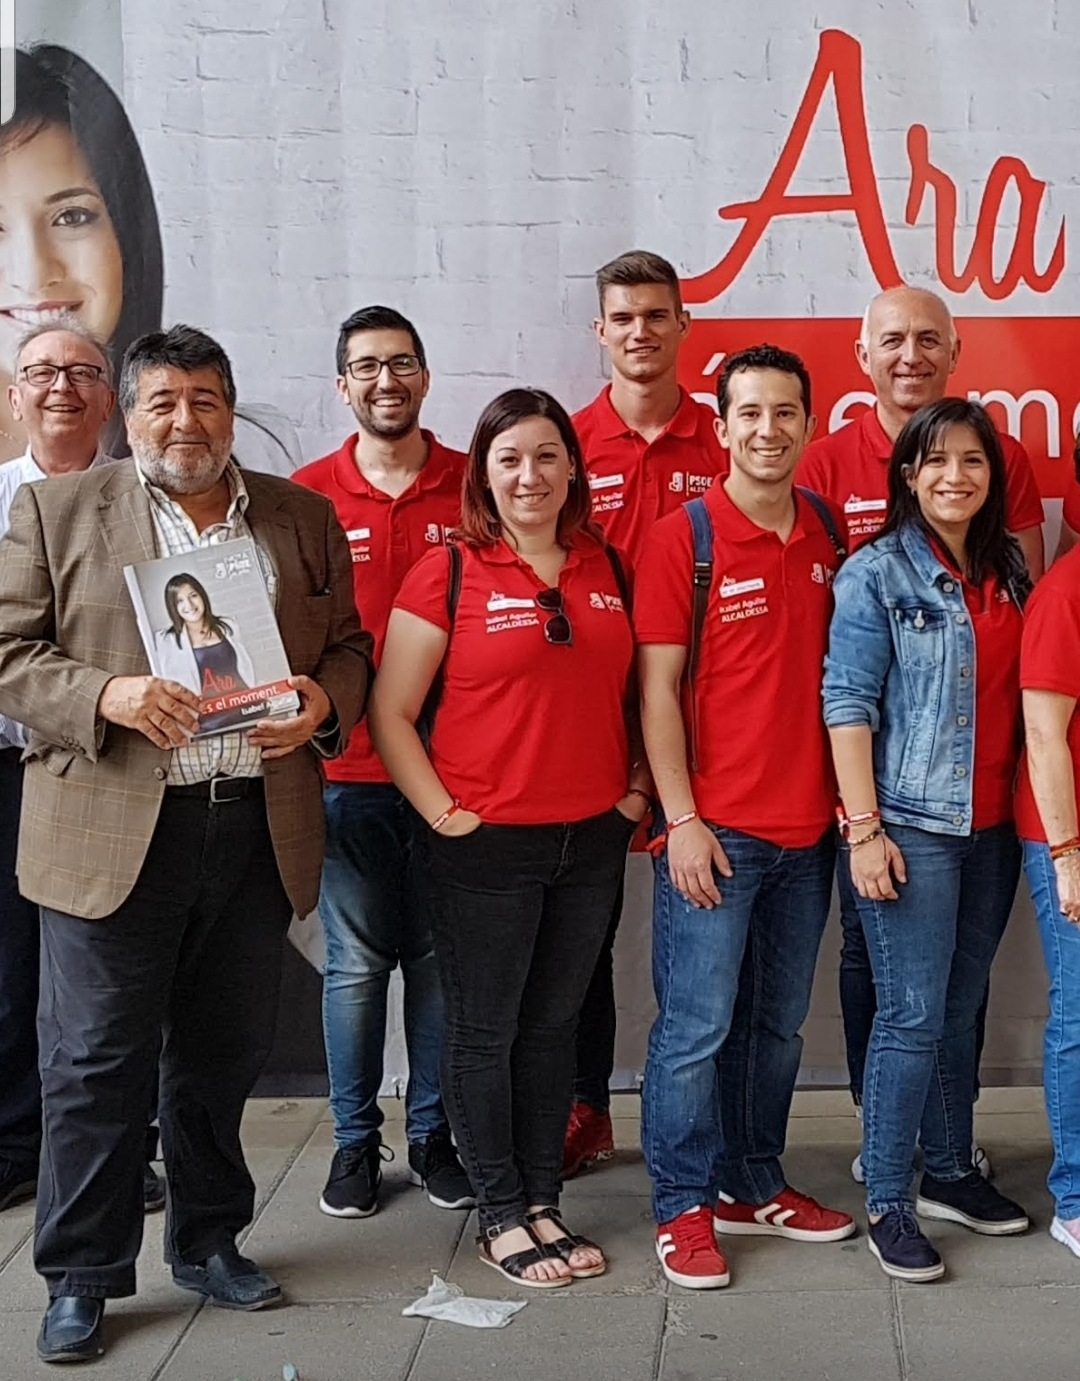 psoe yago - Alzira Radio notícies d'Alzira